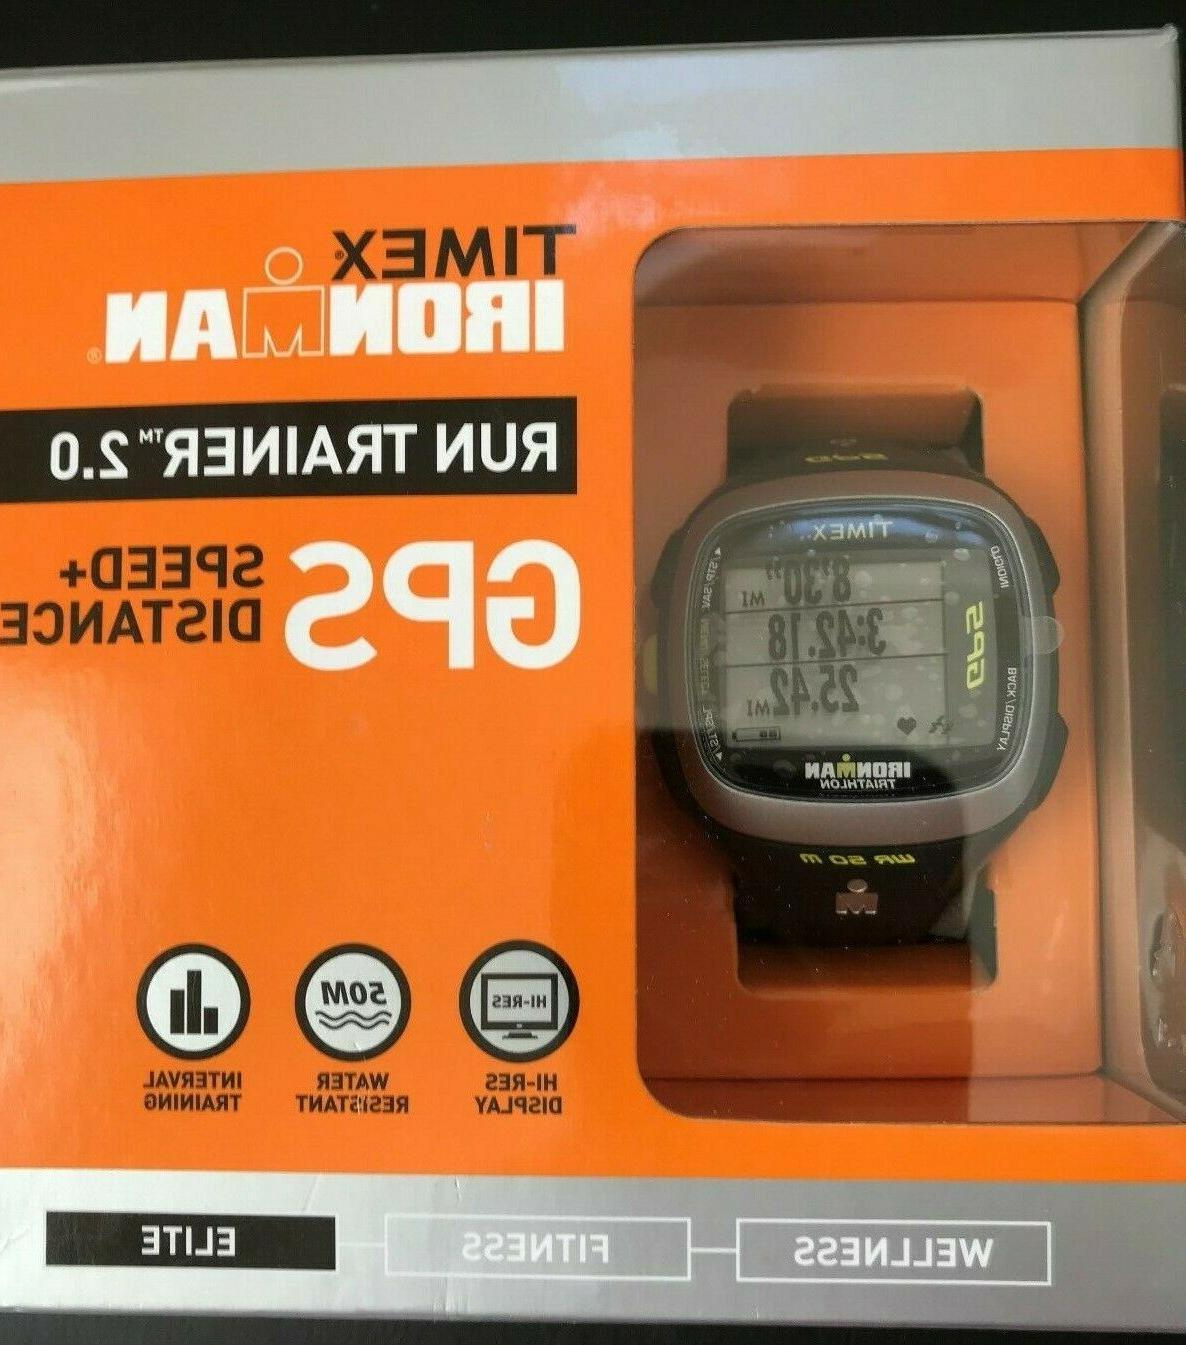 Ironman Run Trainer 2.0 GPS Watch